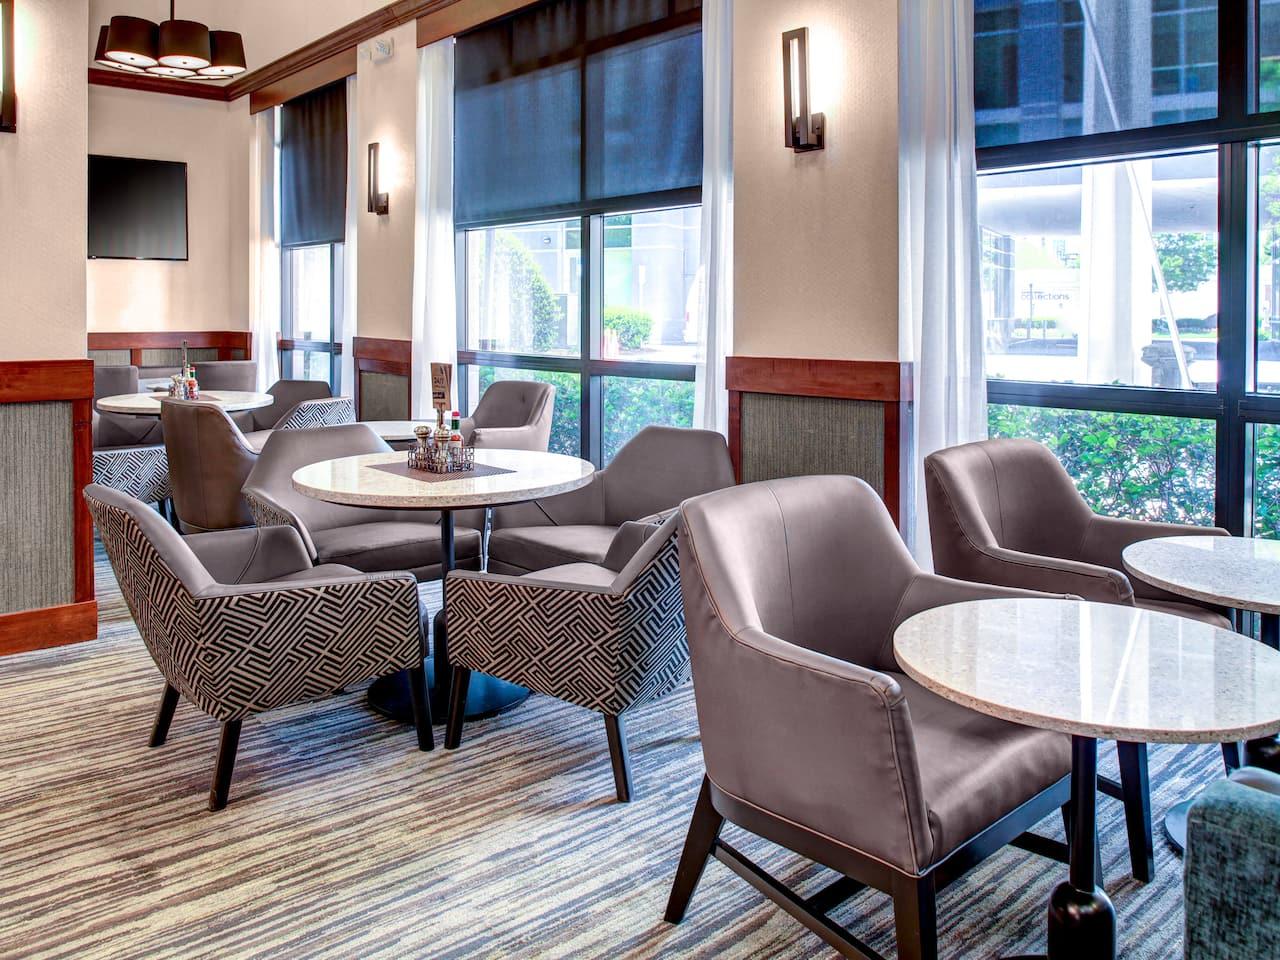 Hotels near Atlanta Lobby Gallery Seating at the Hyatt Place Atlanta/Buckhead